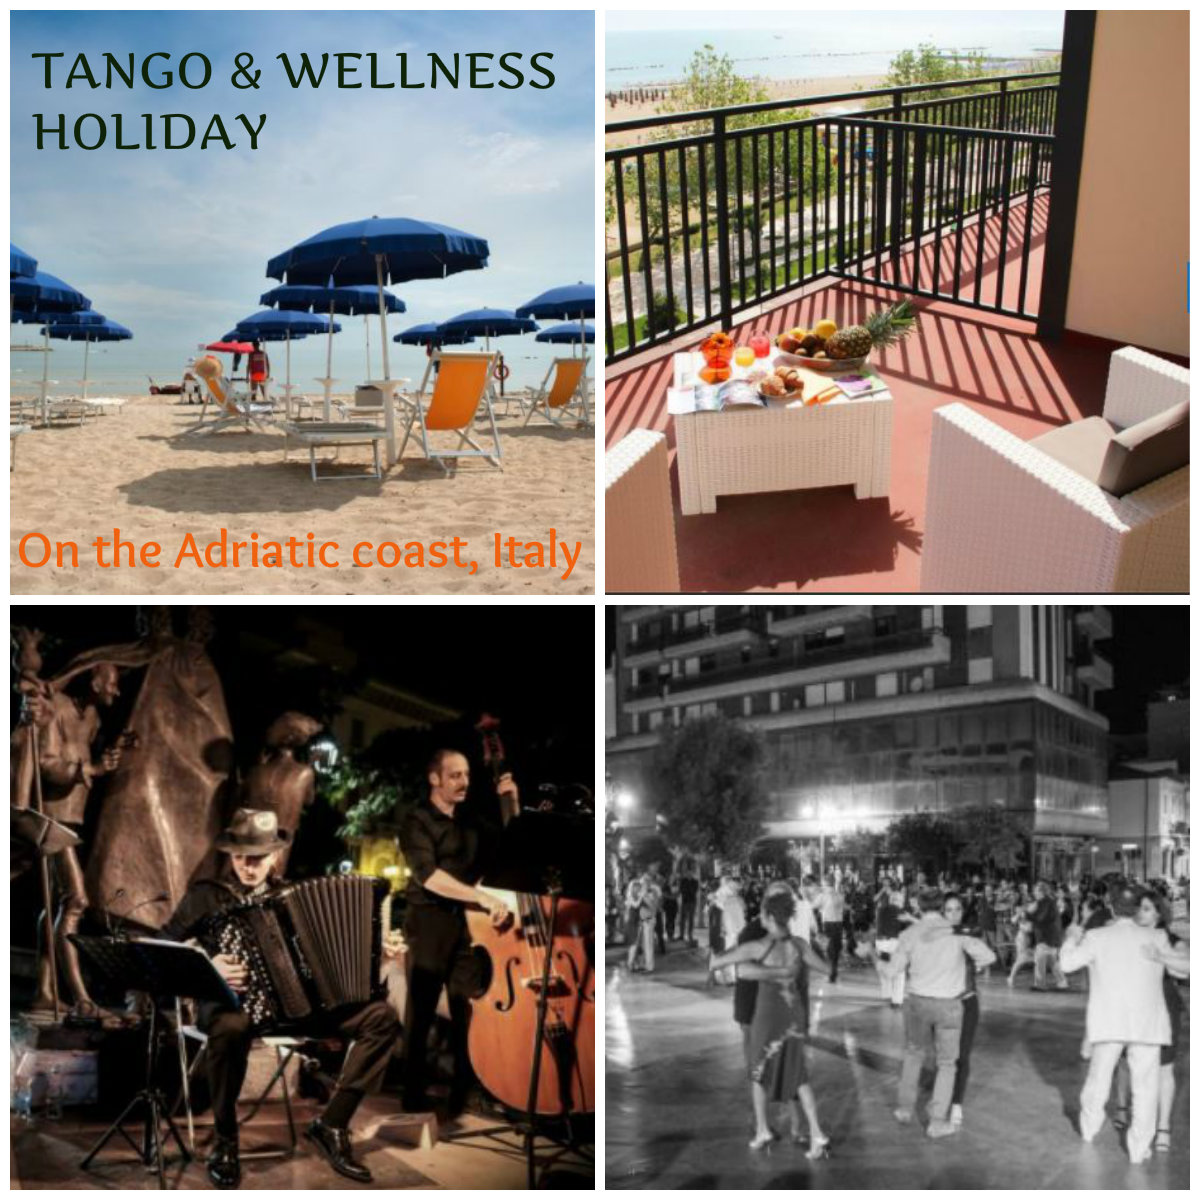 TANGO & WELLNESS HOLIDAY